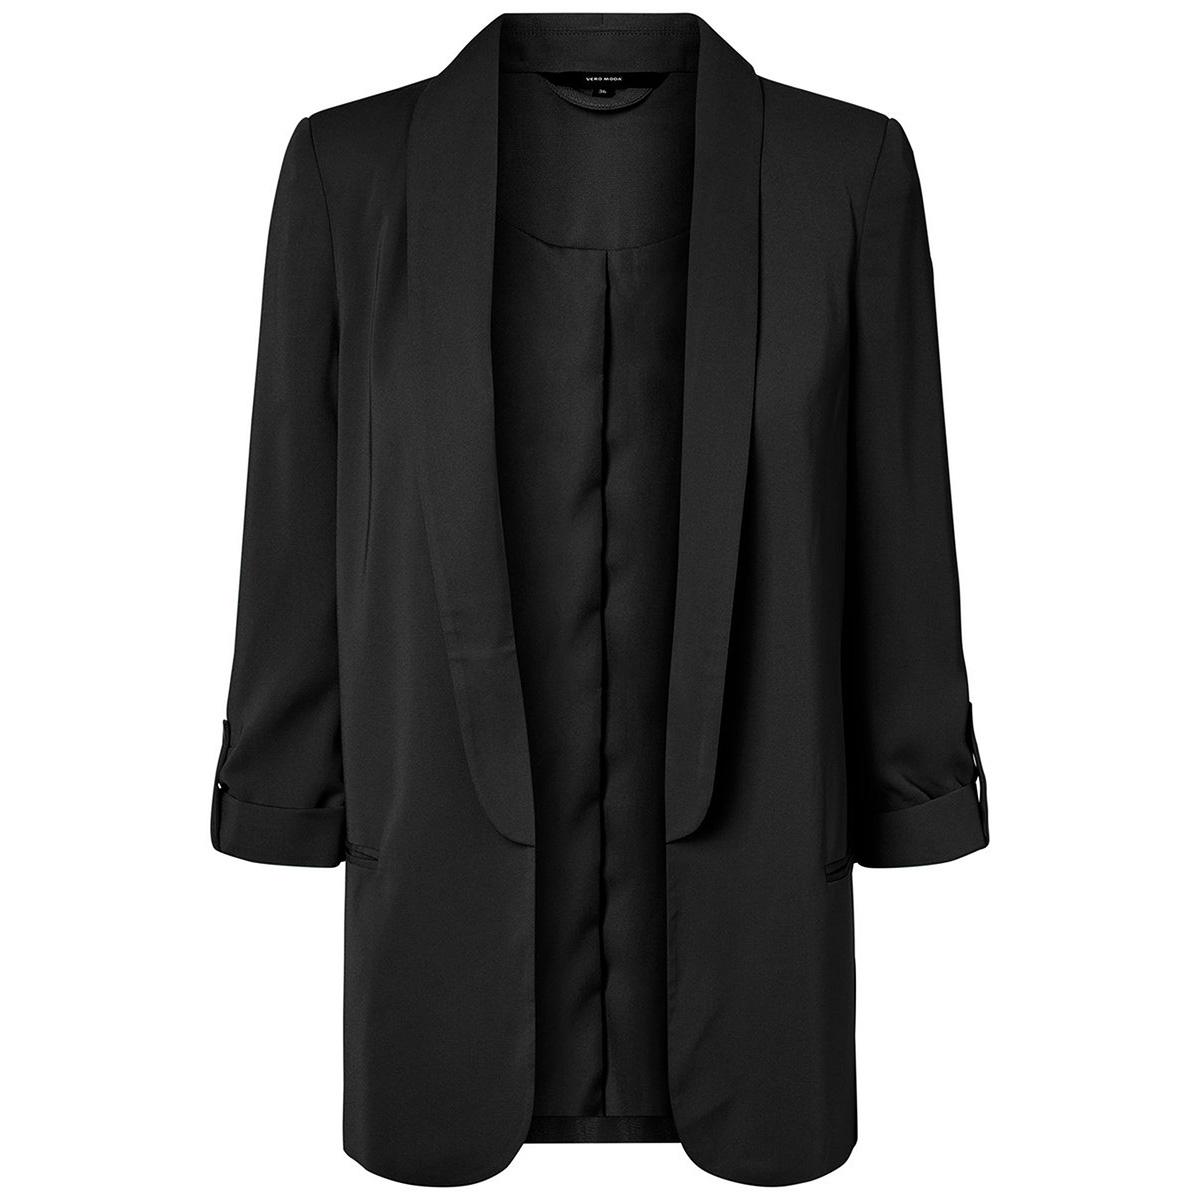 vmyiki 3/4 sleeve  blazer exp 10203389 vero moda blazer black